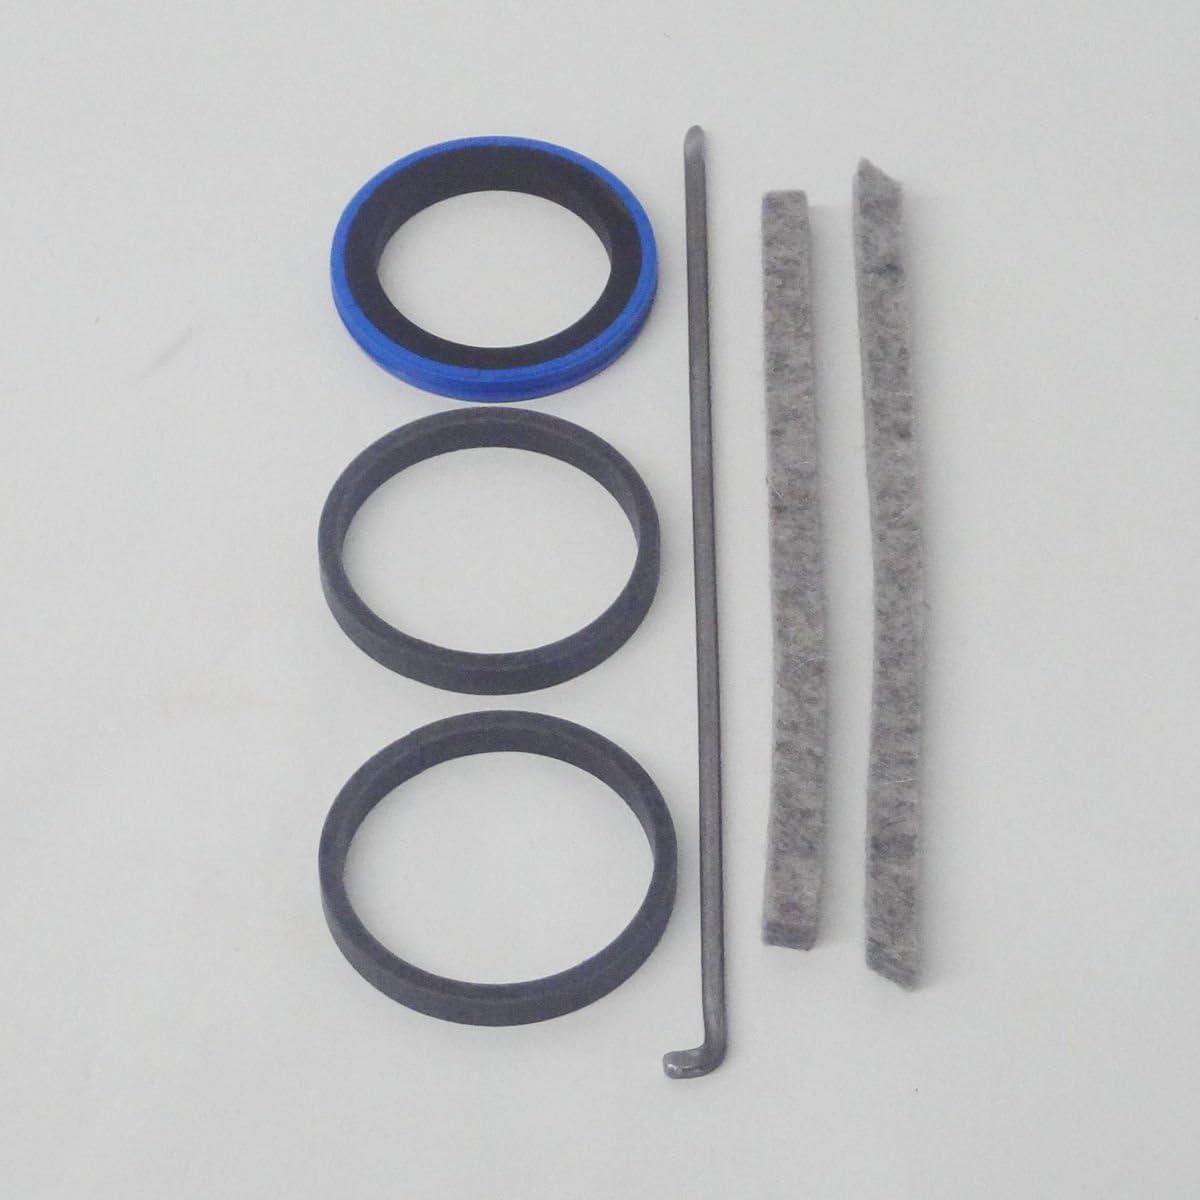 rebuild kit 7-9k lbs 11014 Challenger Lift cylinder seal kit